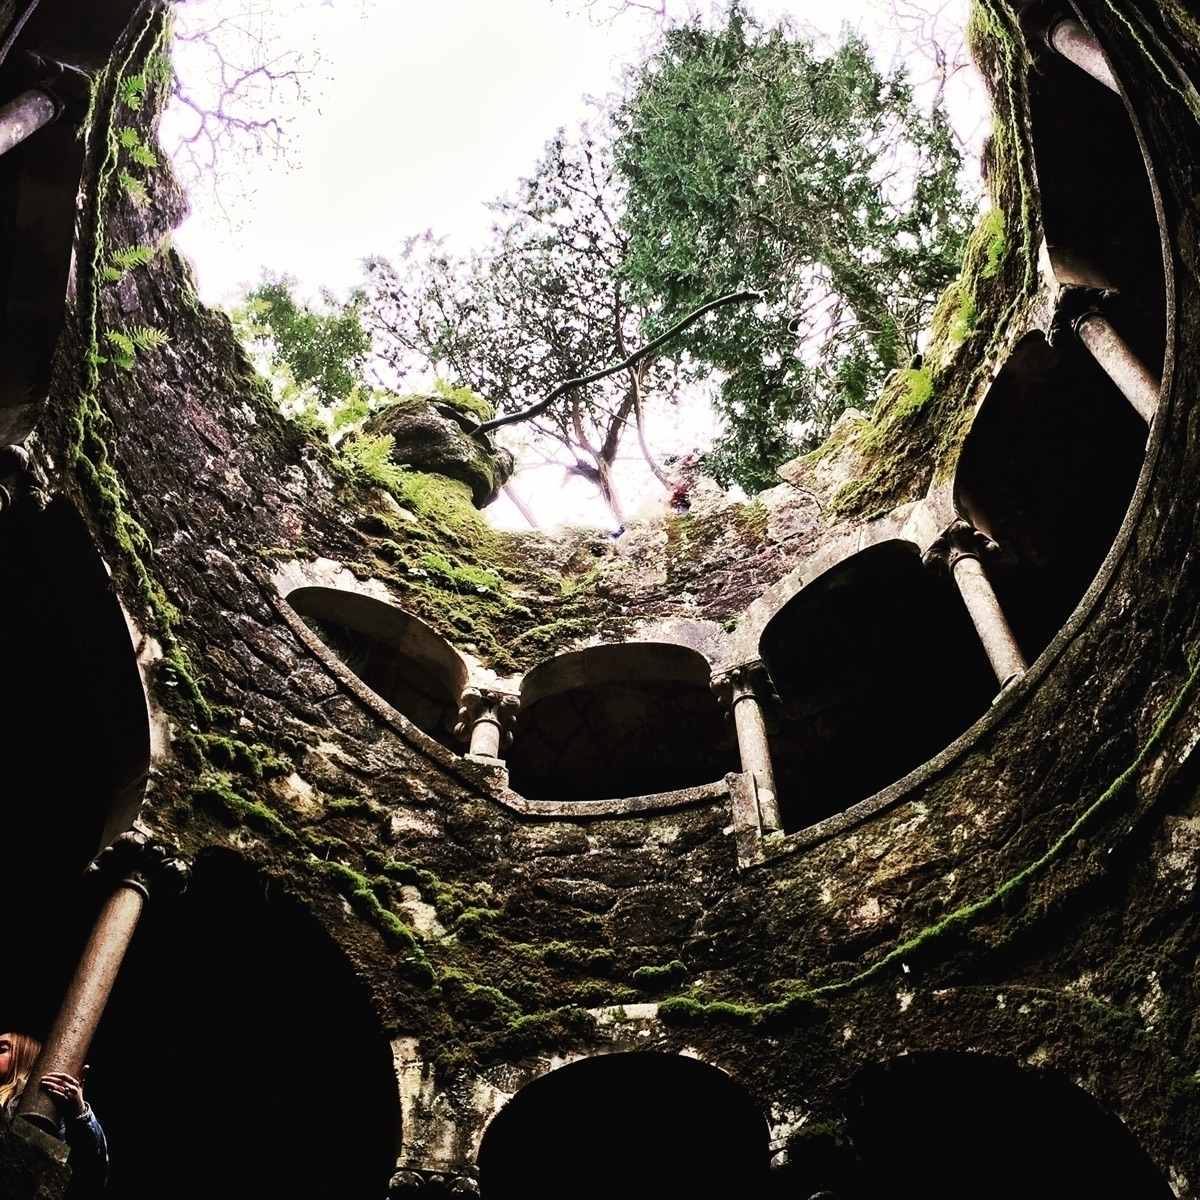 Exploring wells - urban, urbanphotography - jonas_gio | ello